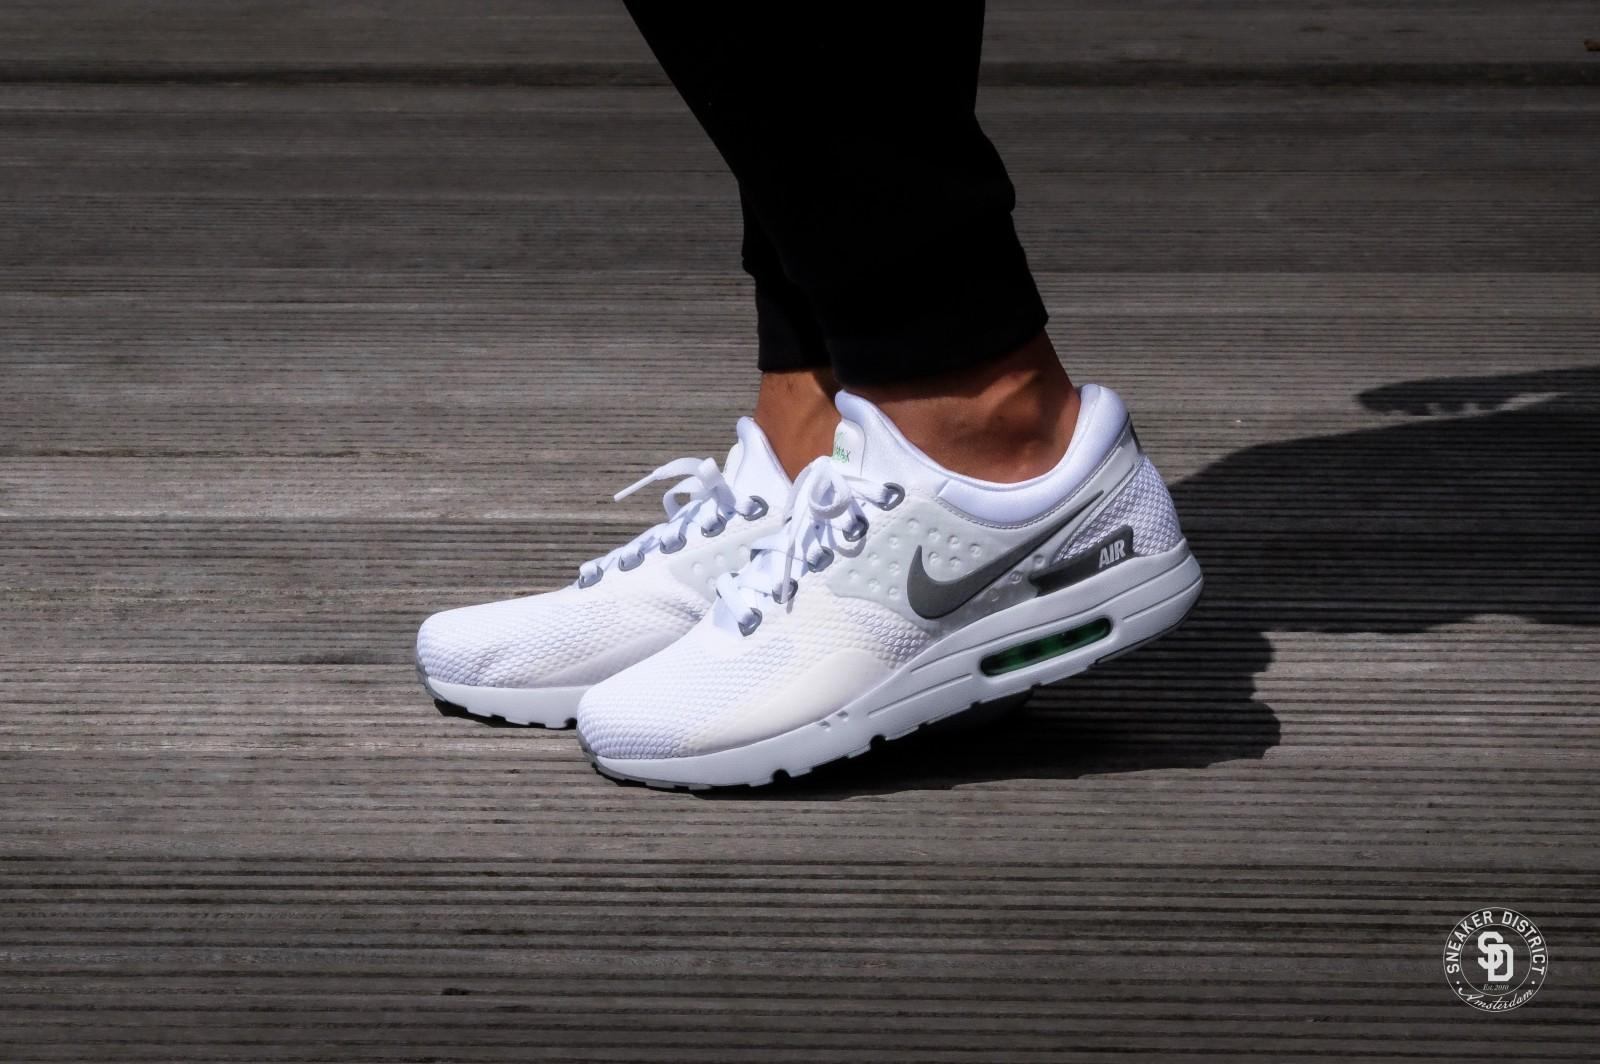 Alainhemet Cher Zero Chaussures Max Air Femme Nike Pas Grande;lection qwB07n88